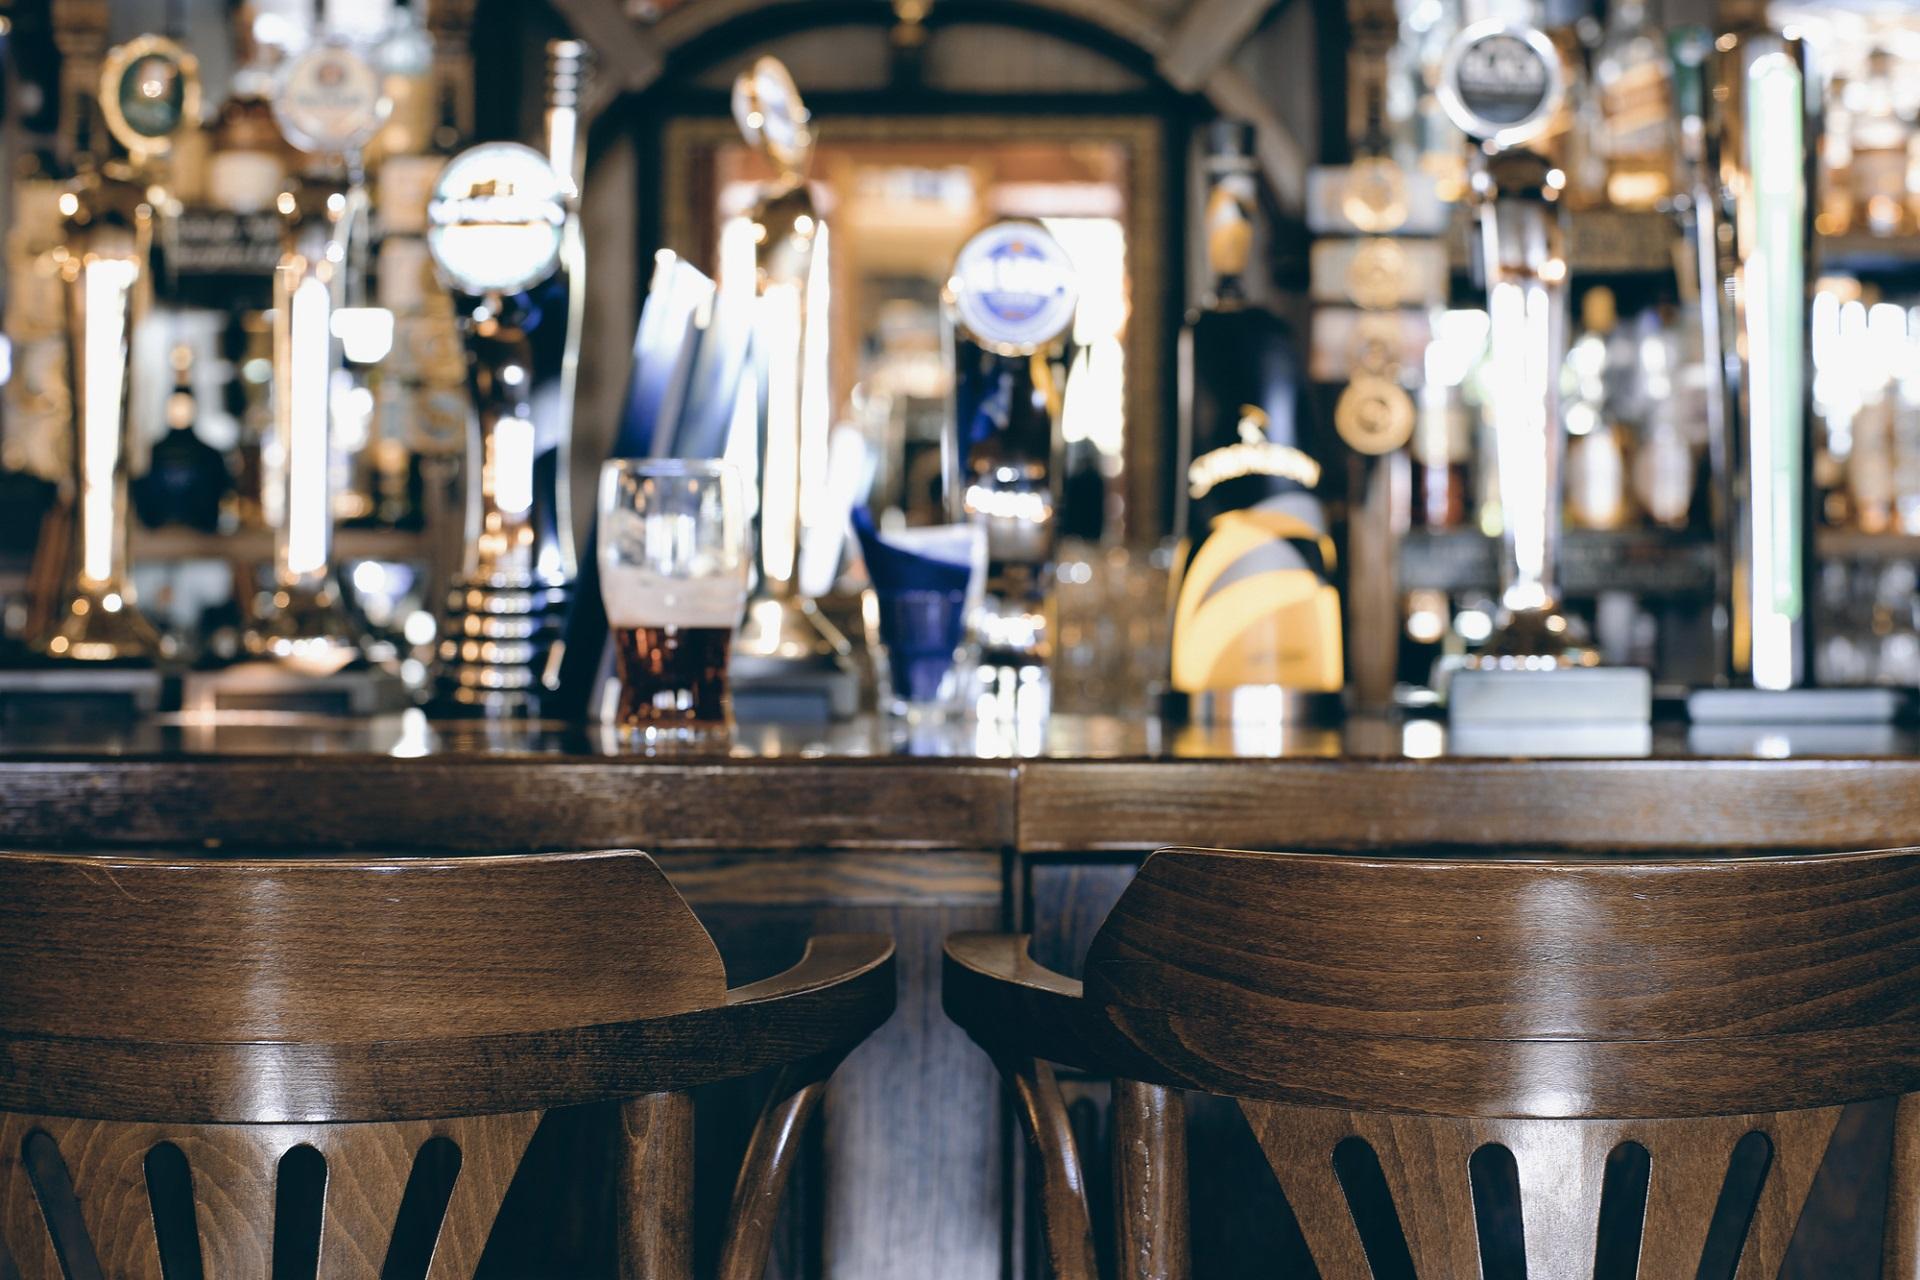 Tips to Follow Before a Good Bar Hop